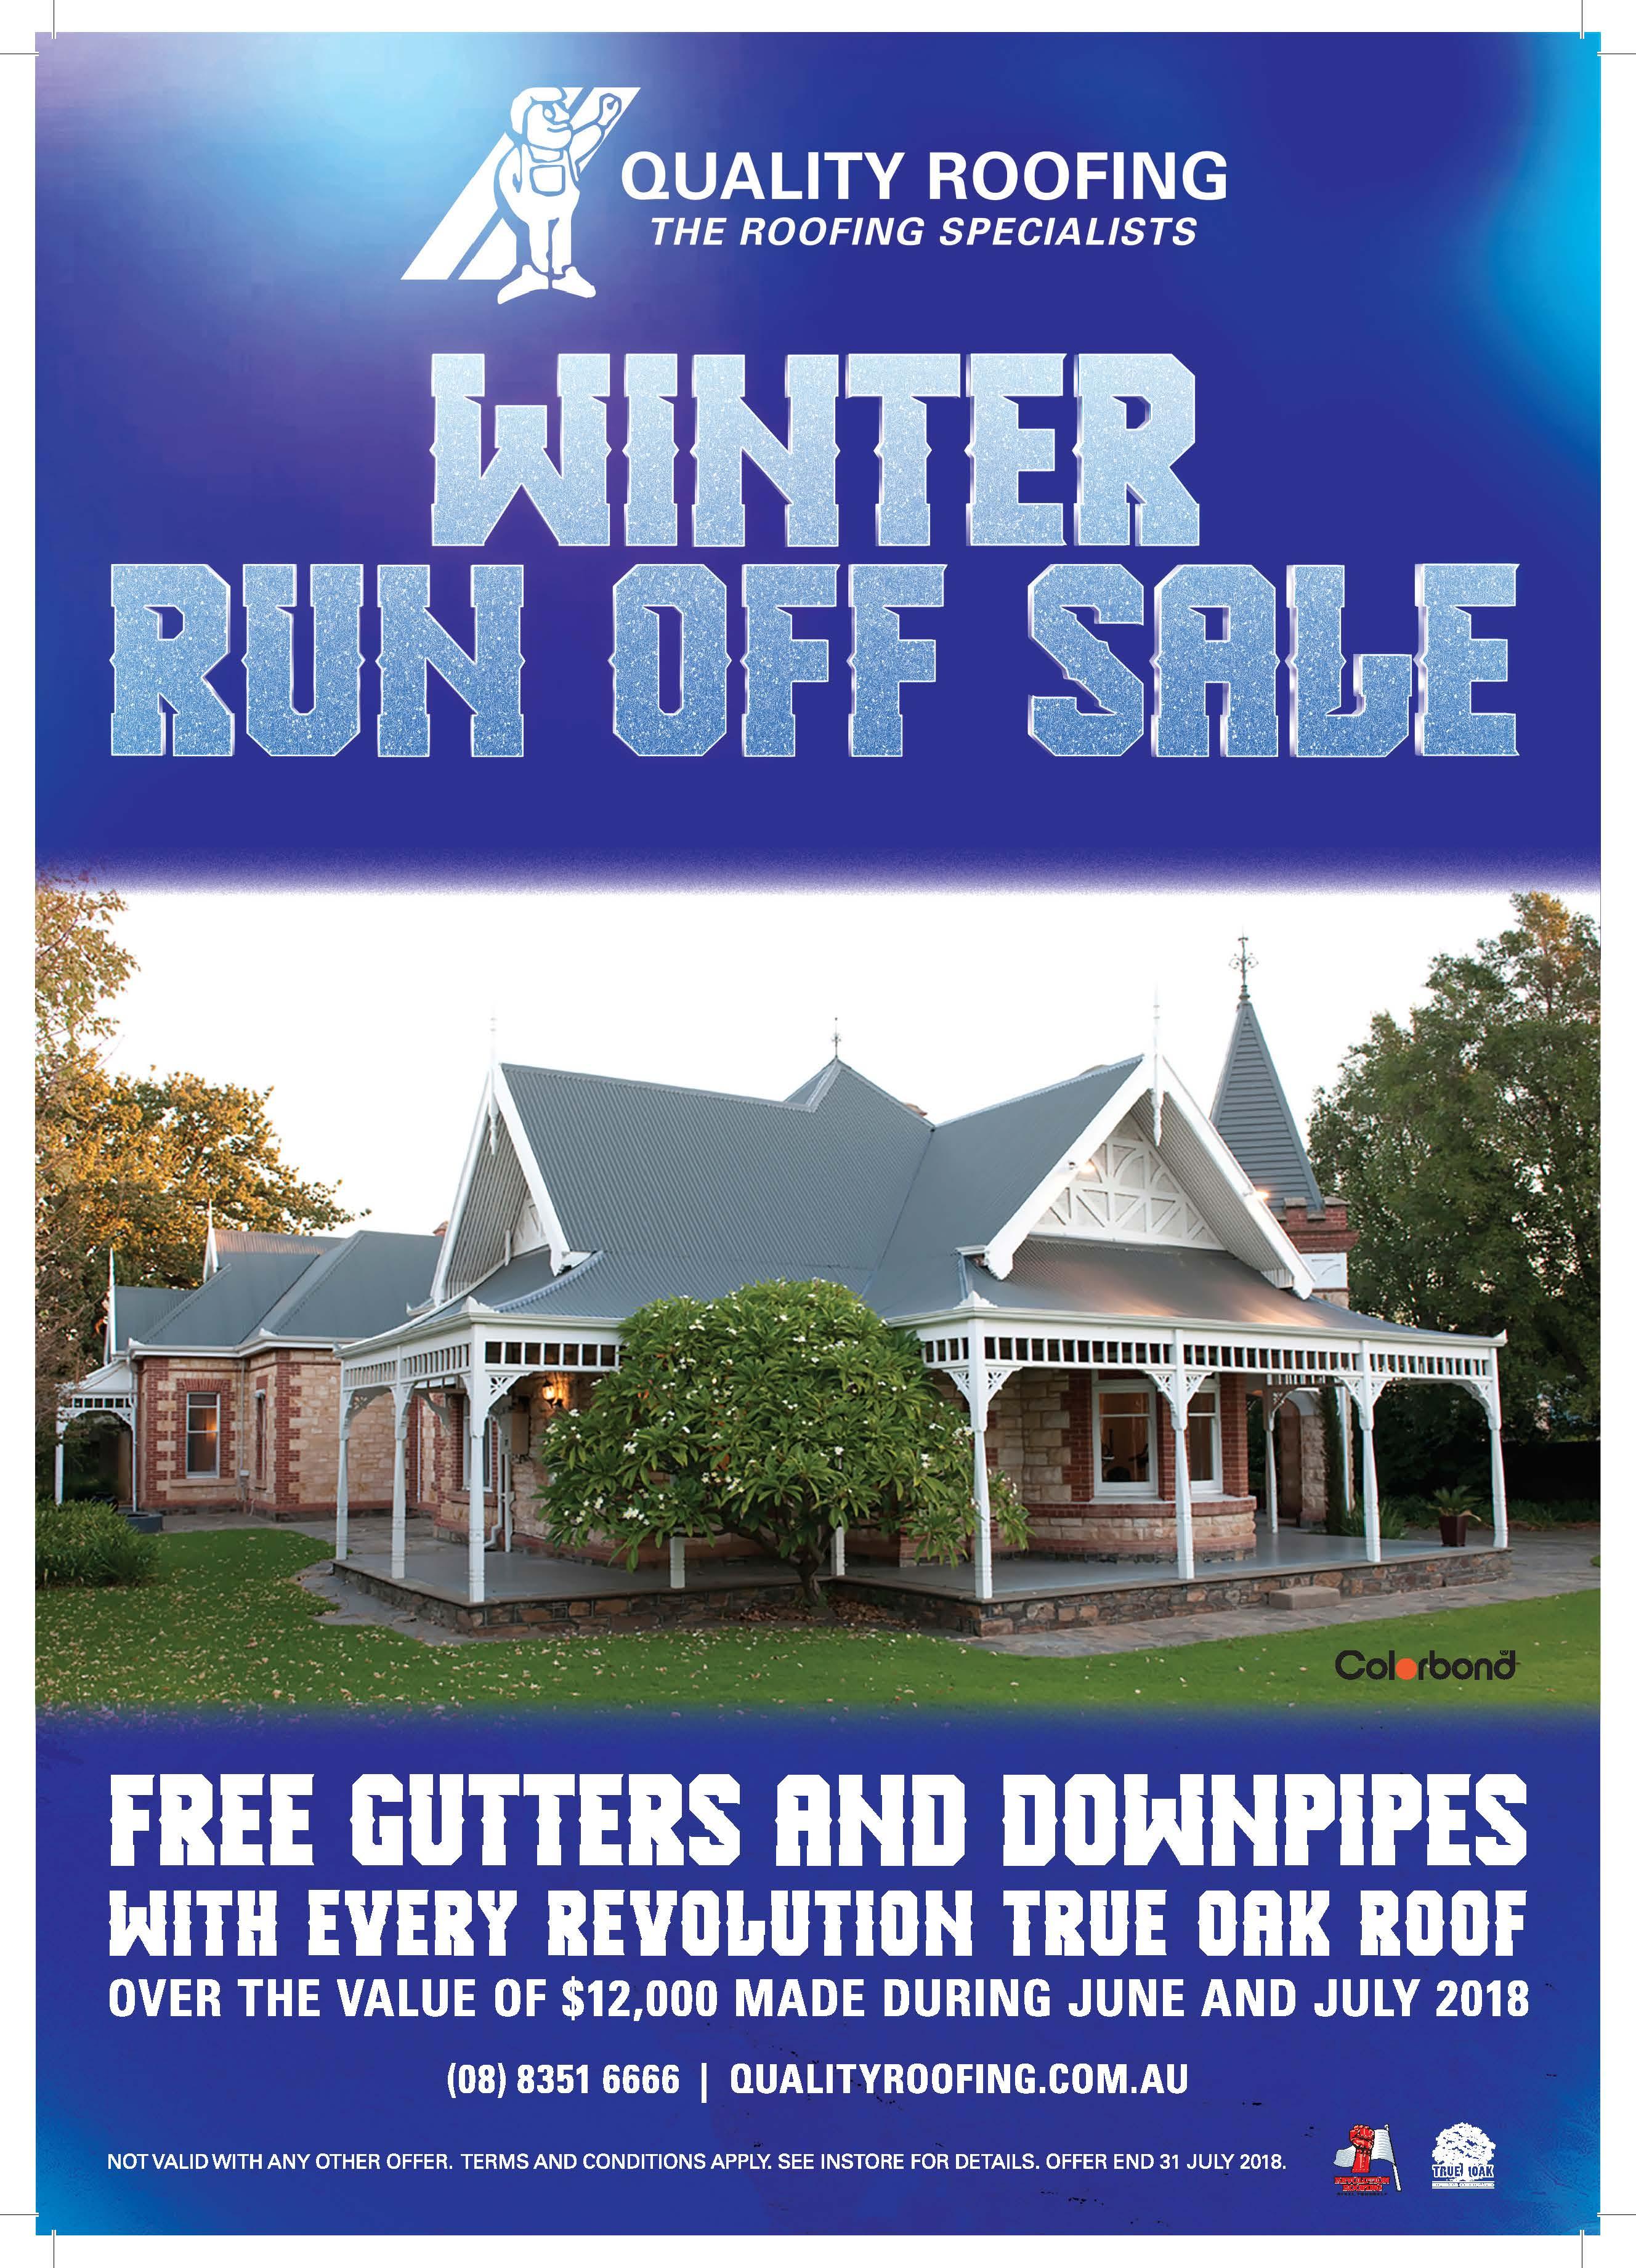 Sa Quality Home Improvements Verandahs Adelaide